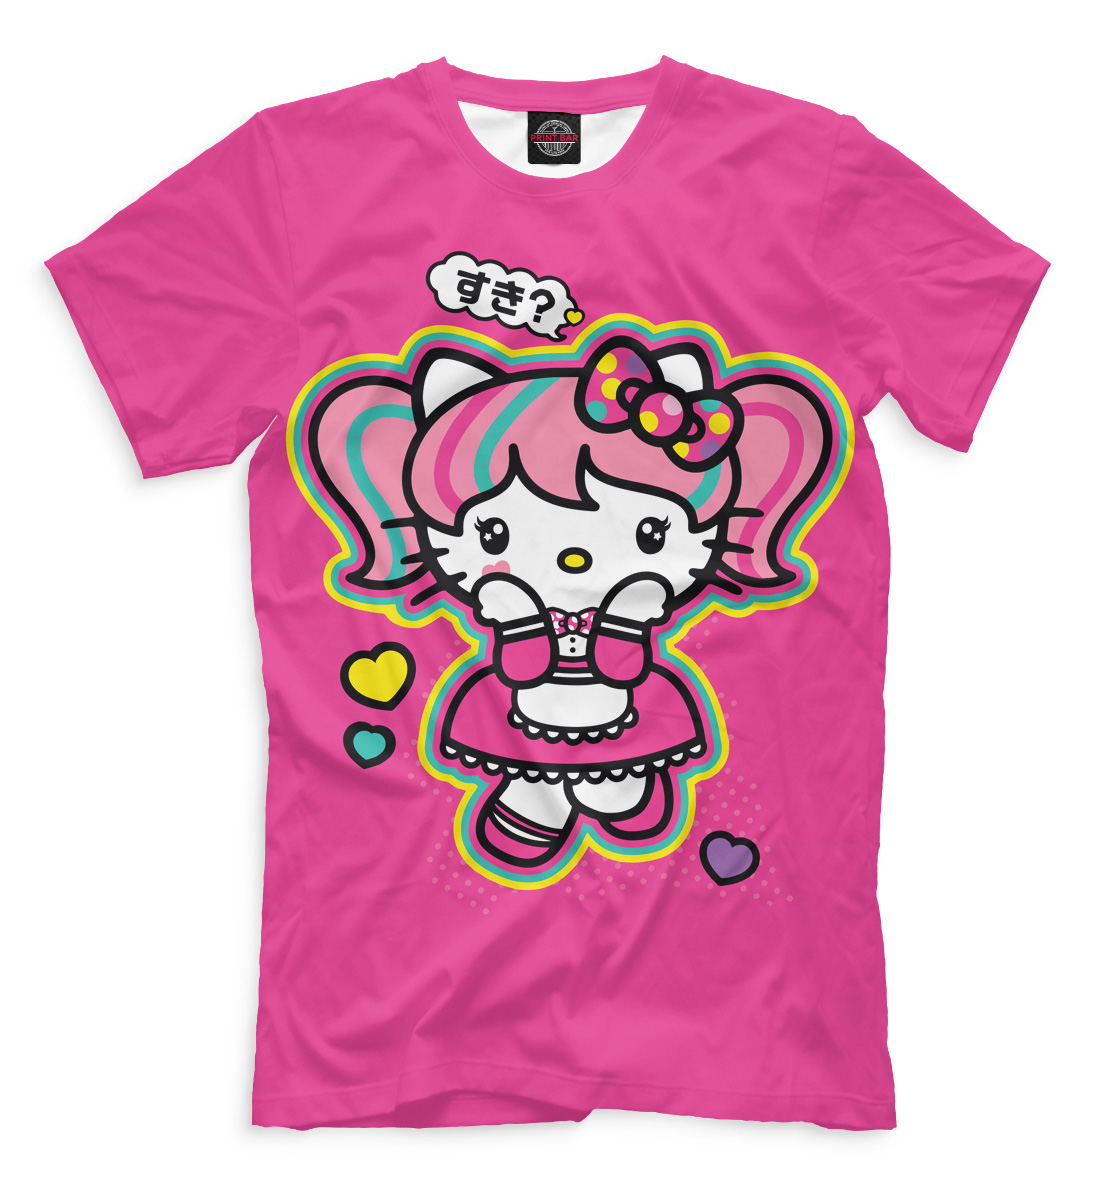 Купить Hello Kitty, Printbar, Футболки, HLK-185738-fut-2